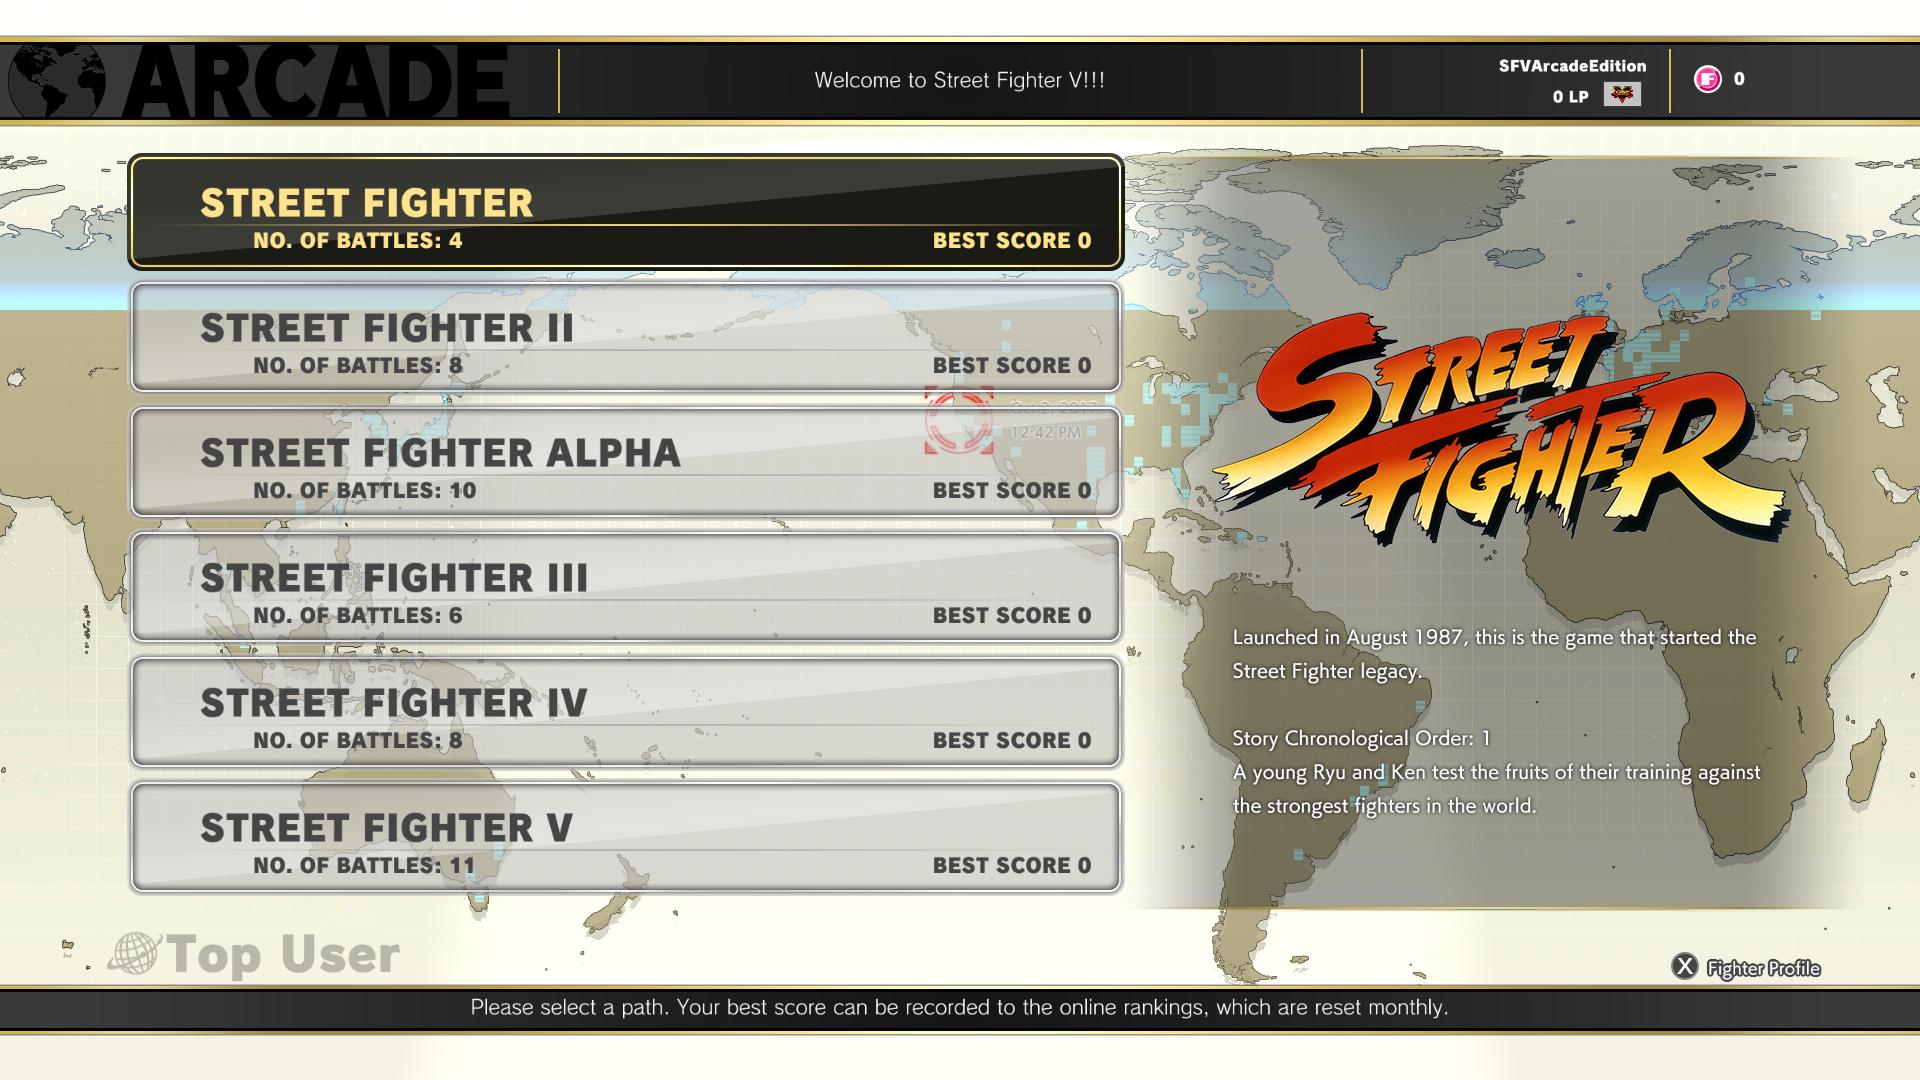 Street Fighter V: Arcade Edition - Arcade Menu